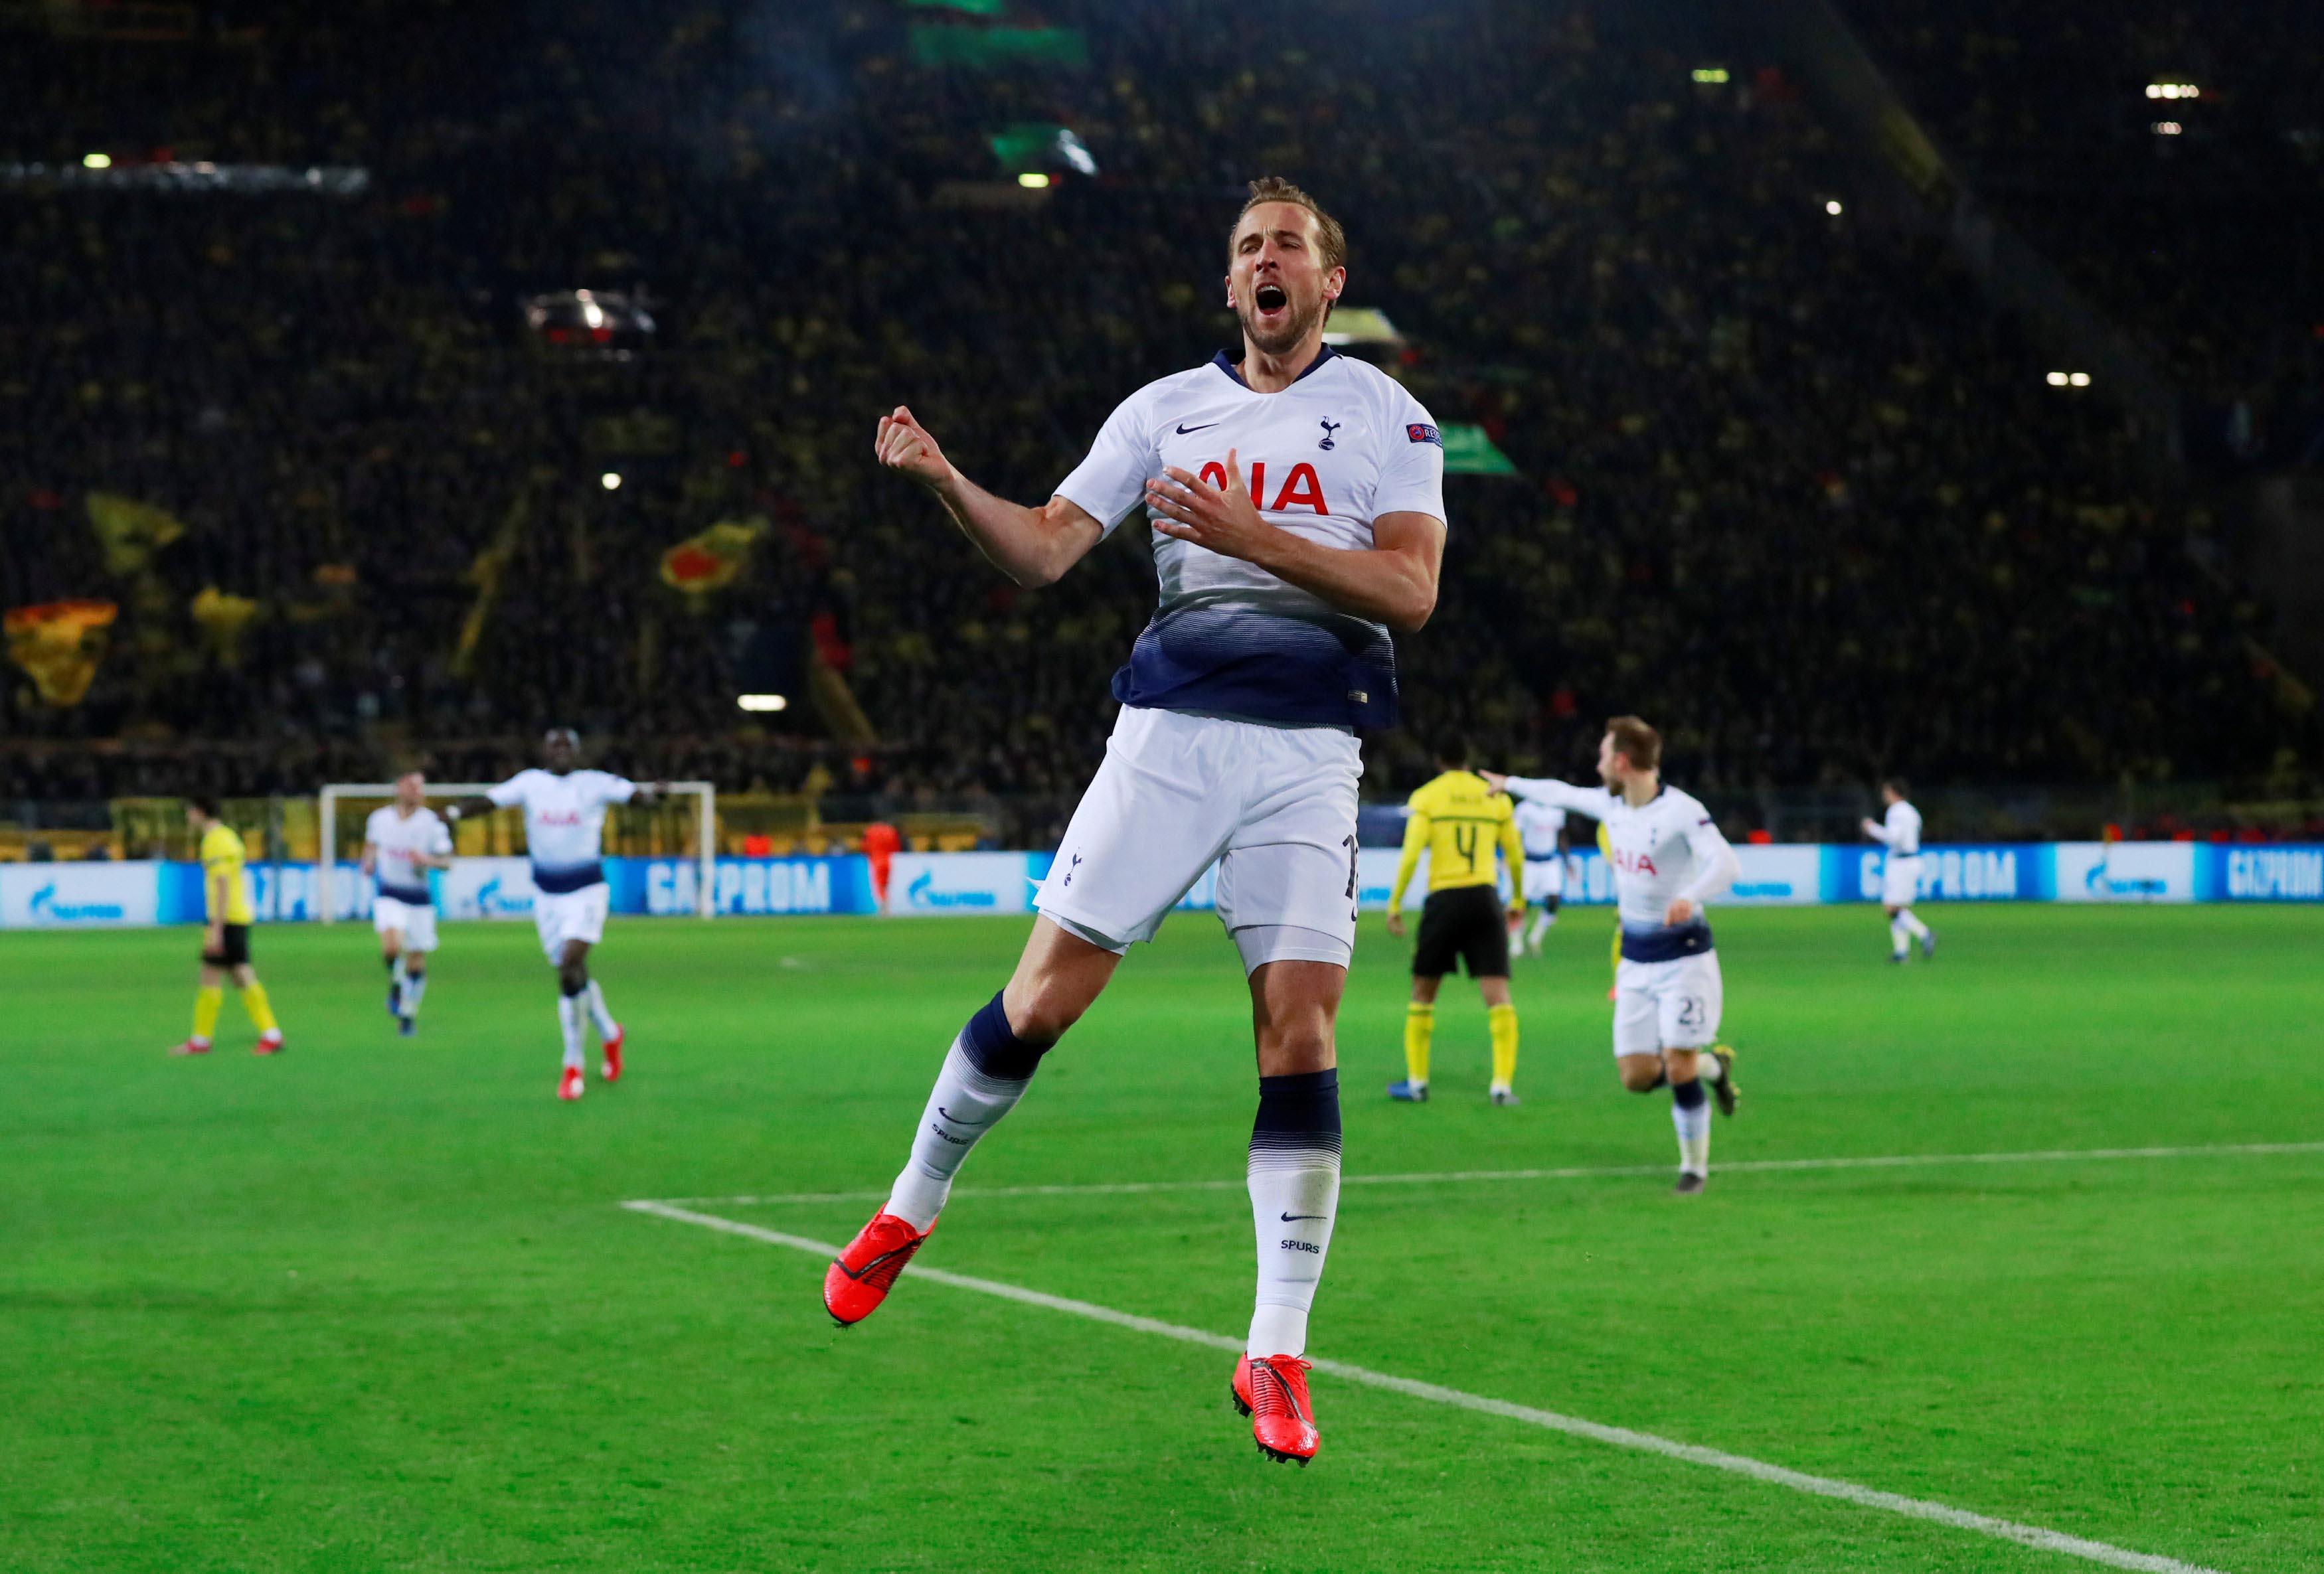 Champions League: Harry Kane scores in Dortmund as Tottenham stroll into last eight